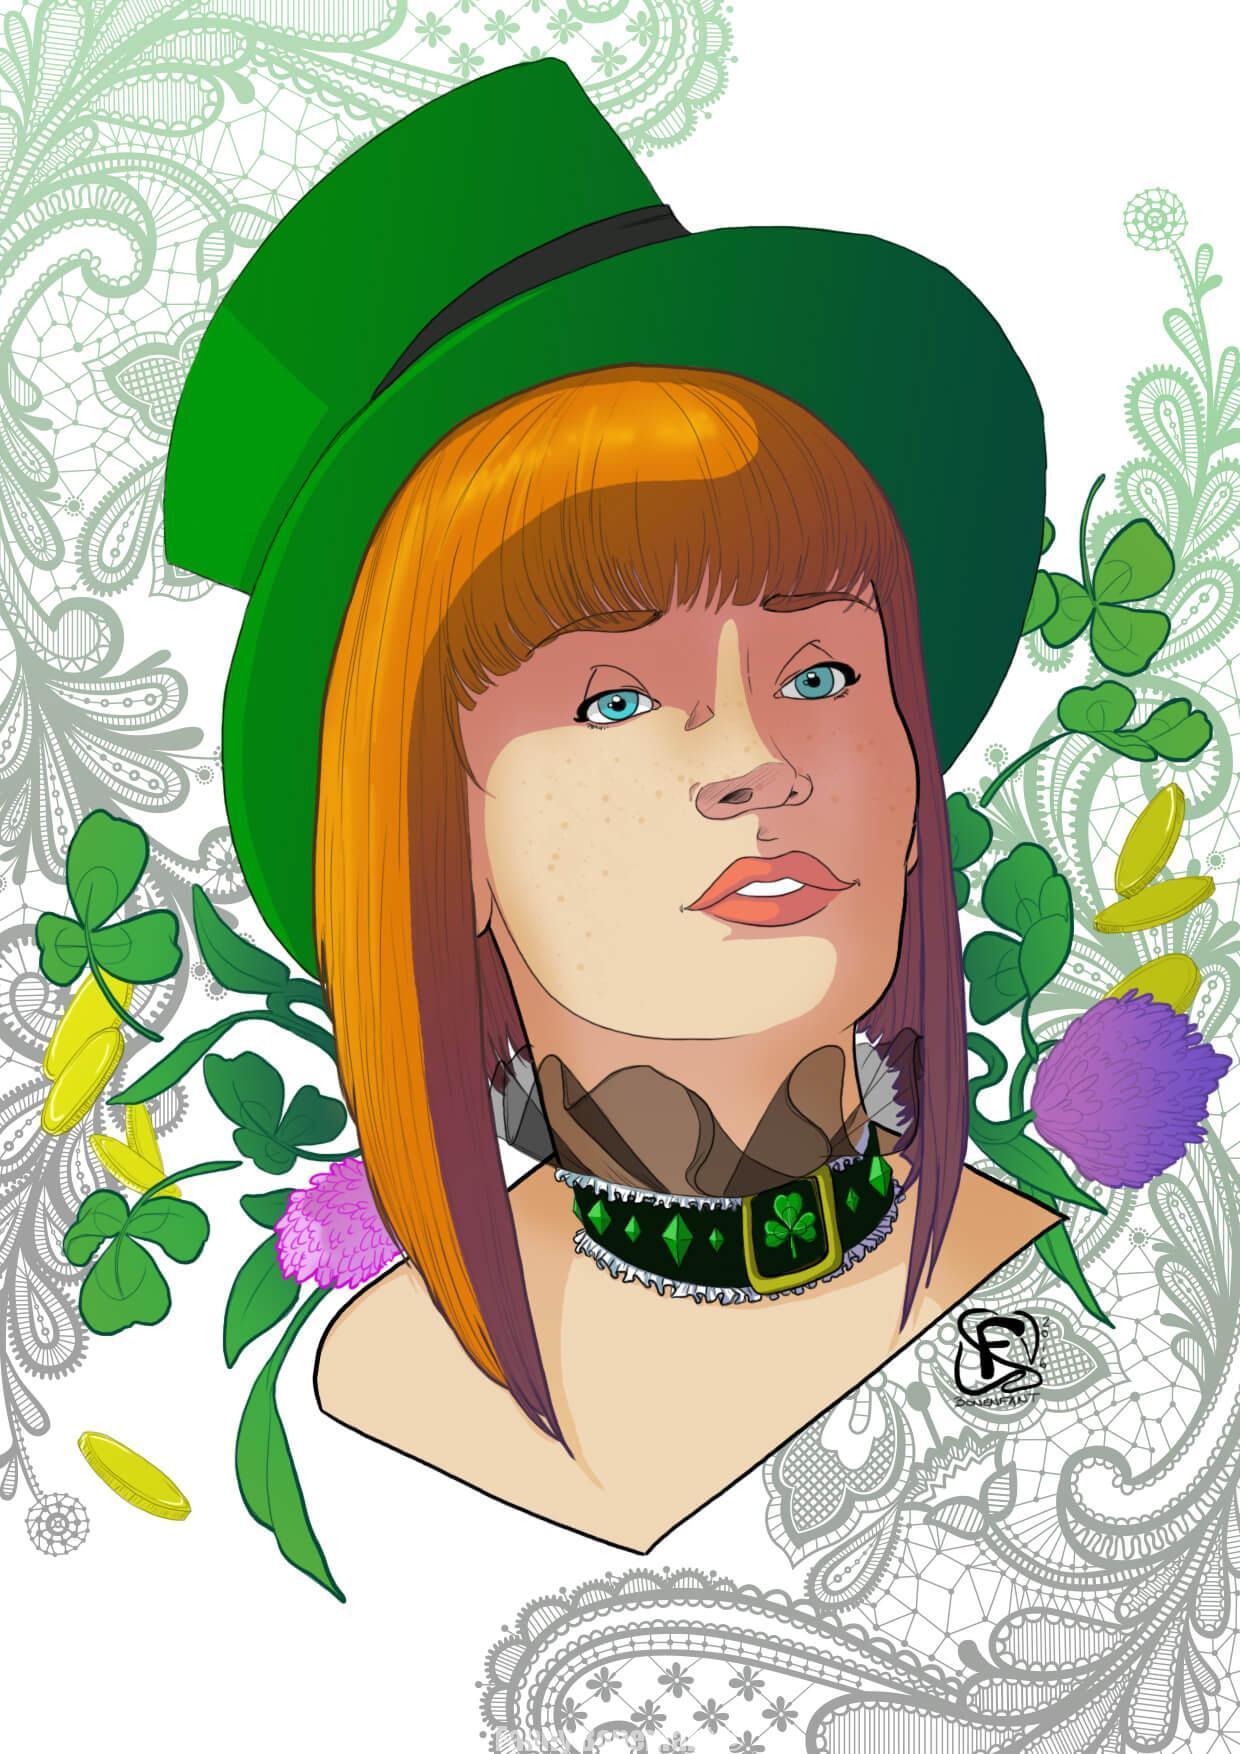 La Saint Patrick 2016 va être artistique !